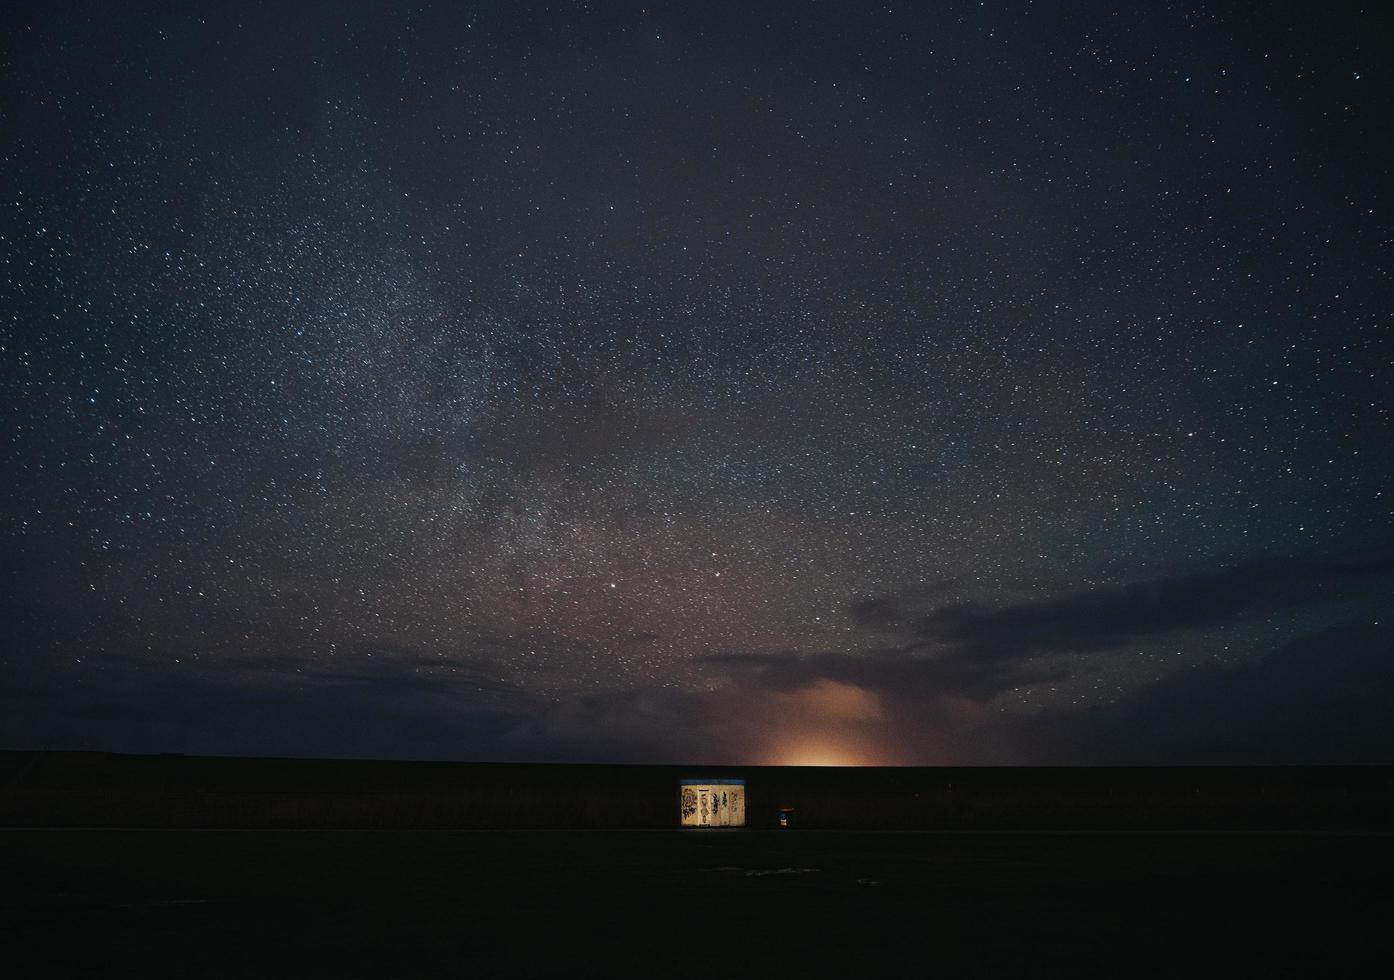 ciel plein d'étoiles photo